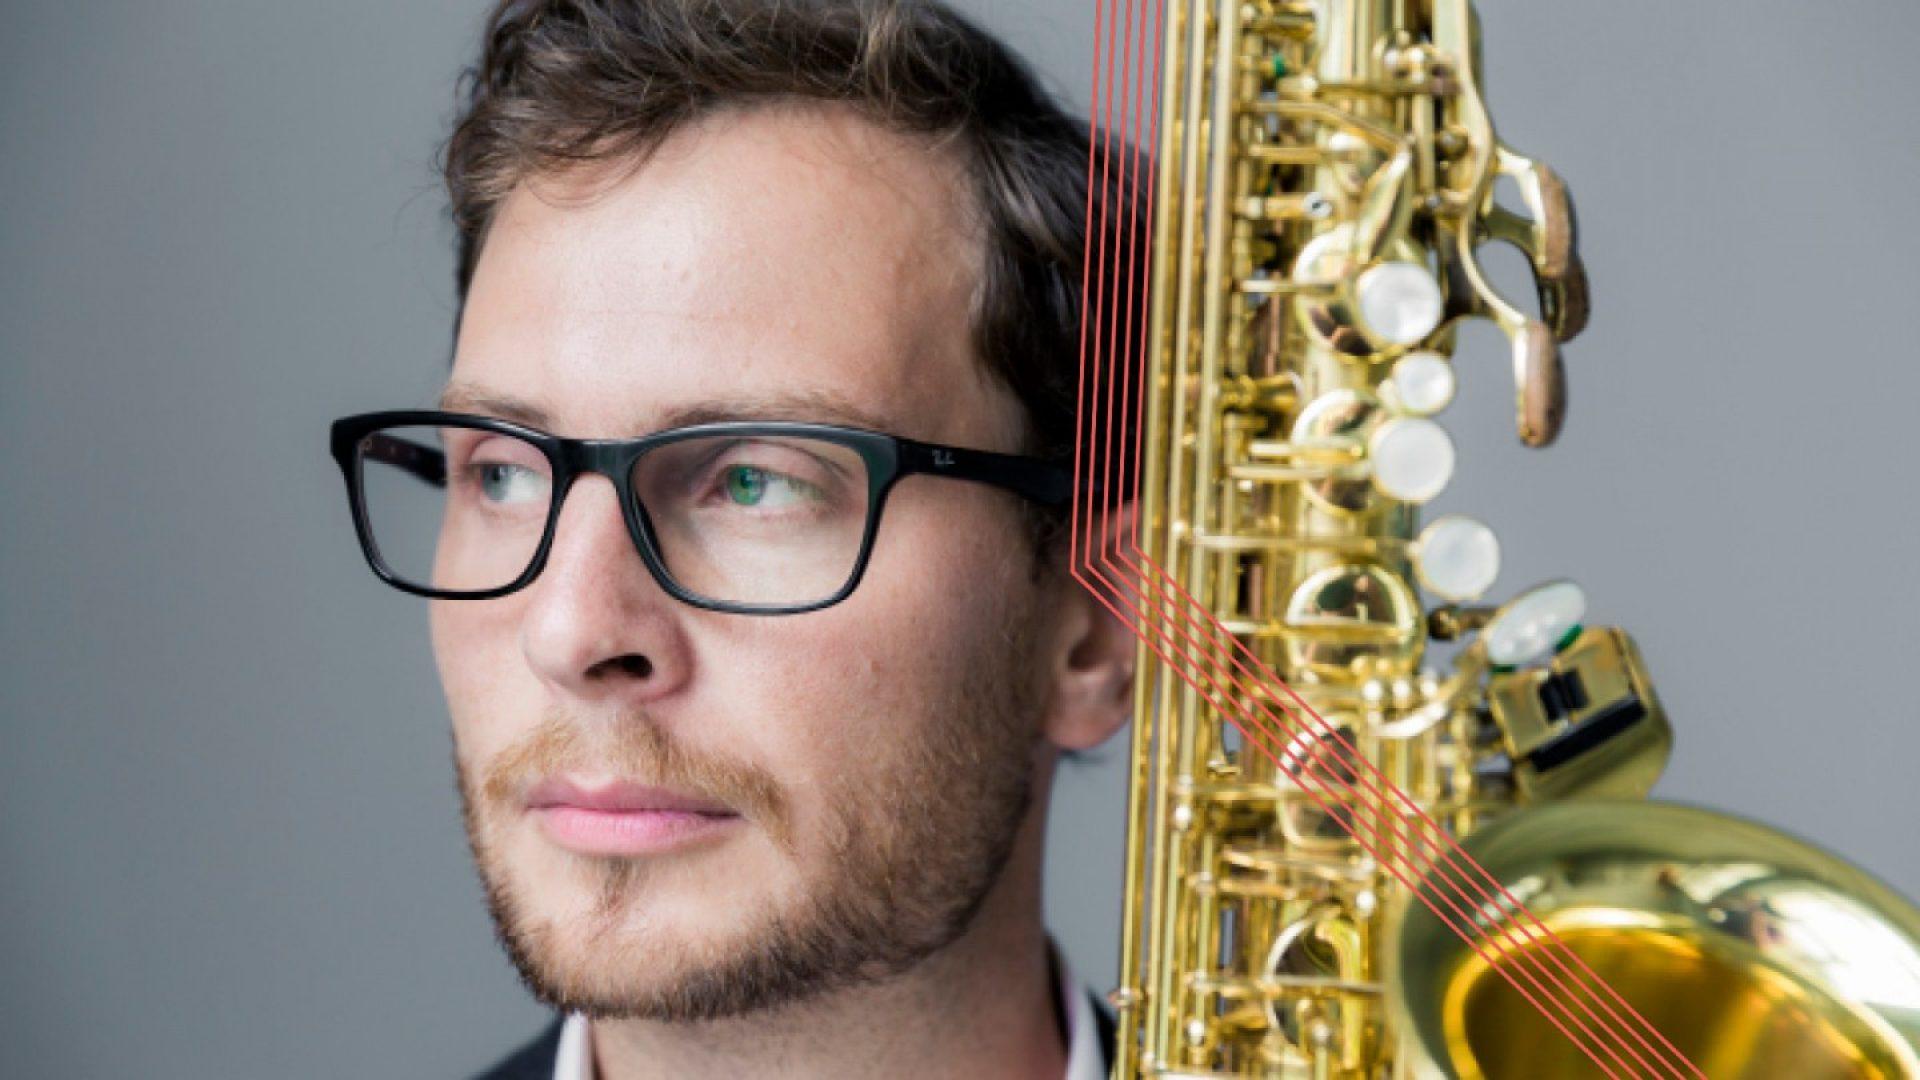 Ola Rokkones med saxofon